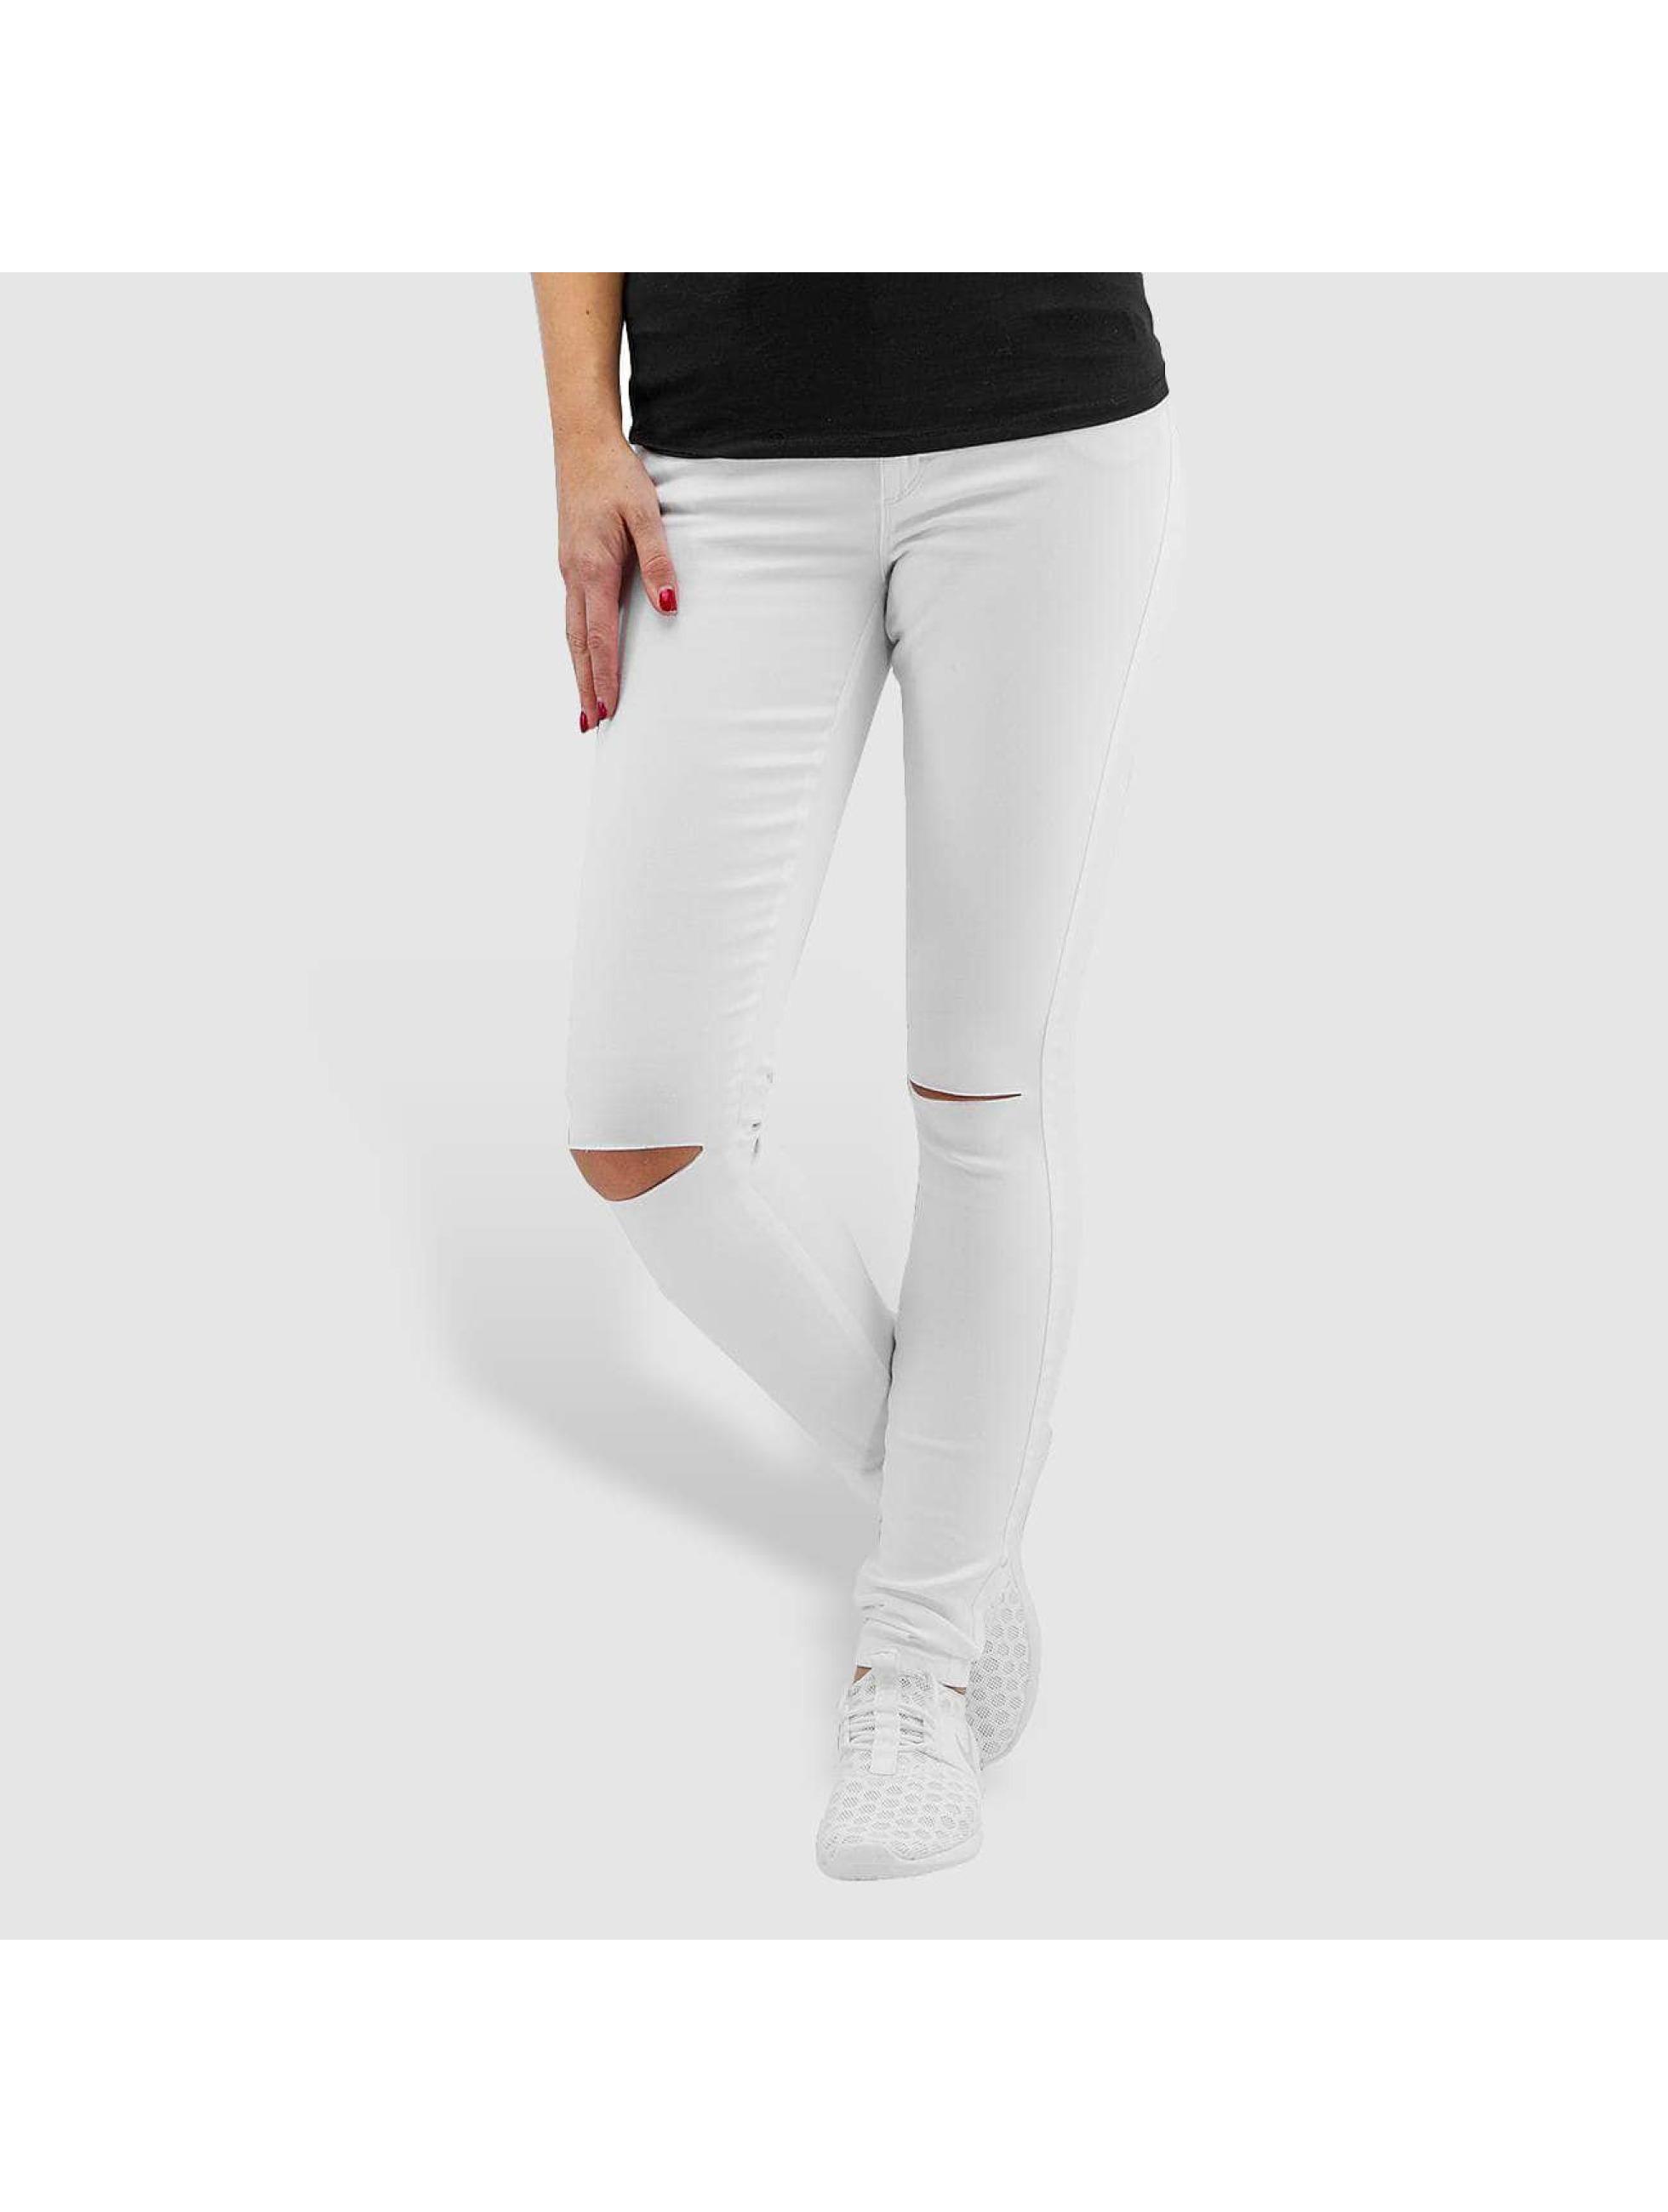 Witte broek heren skinny